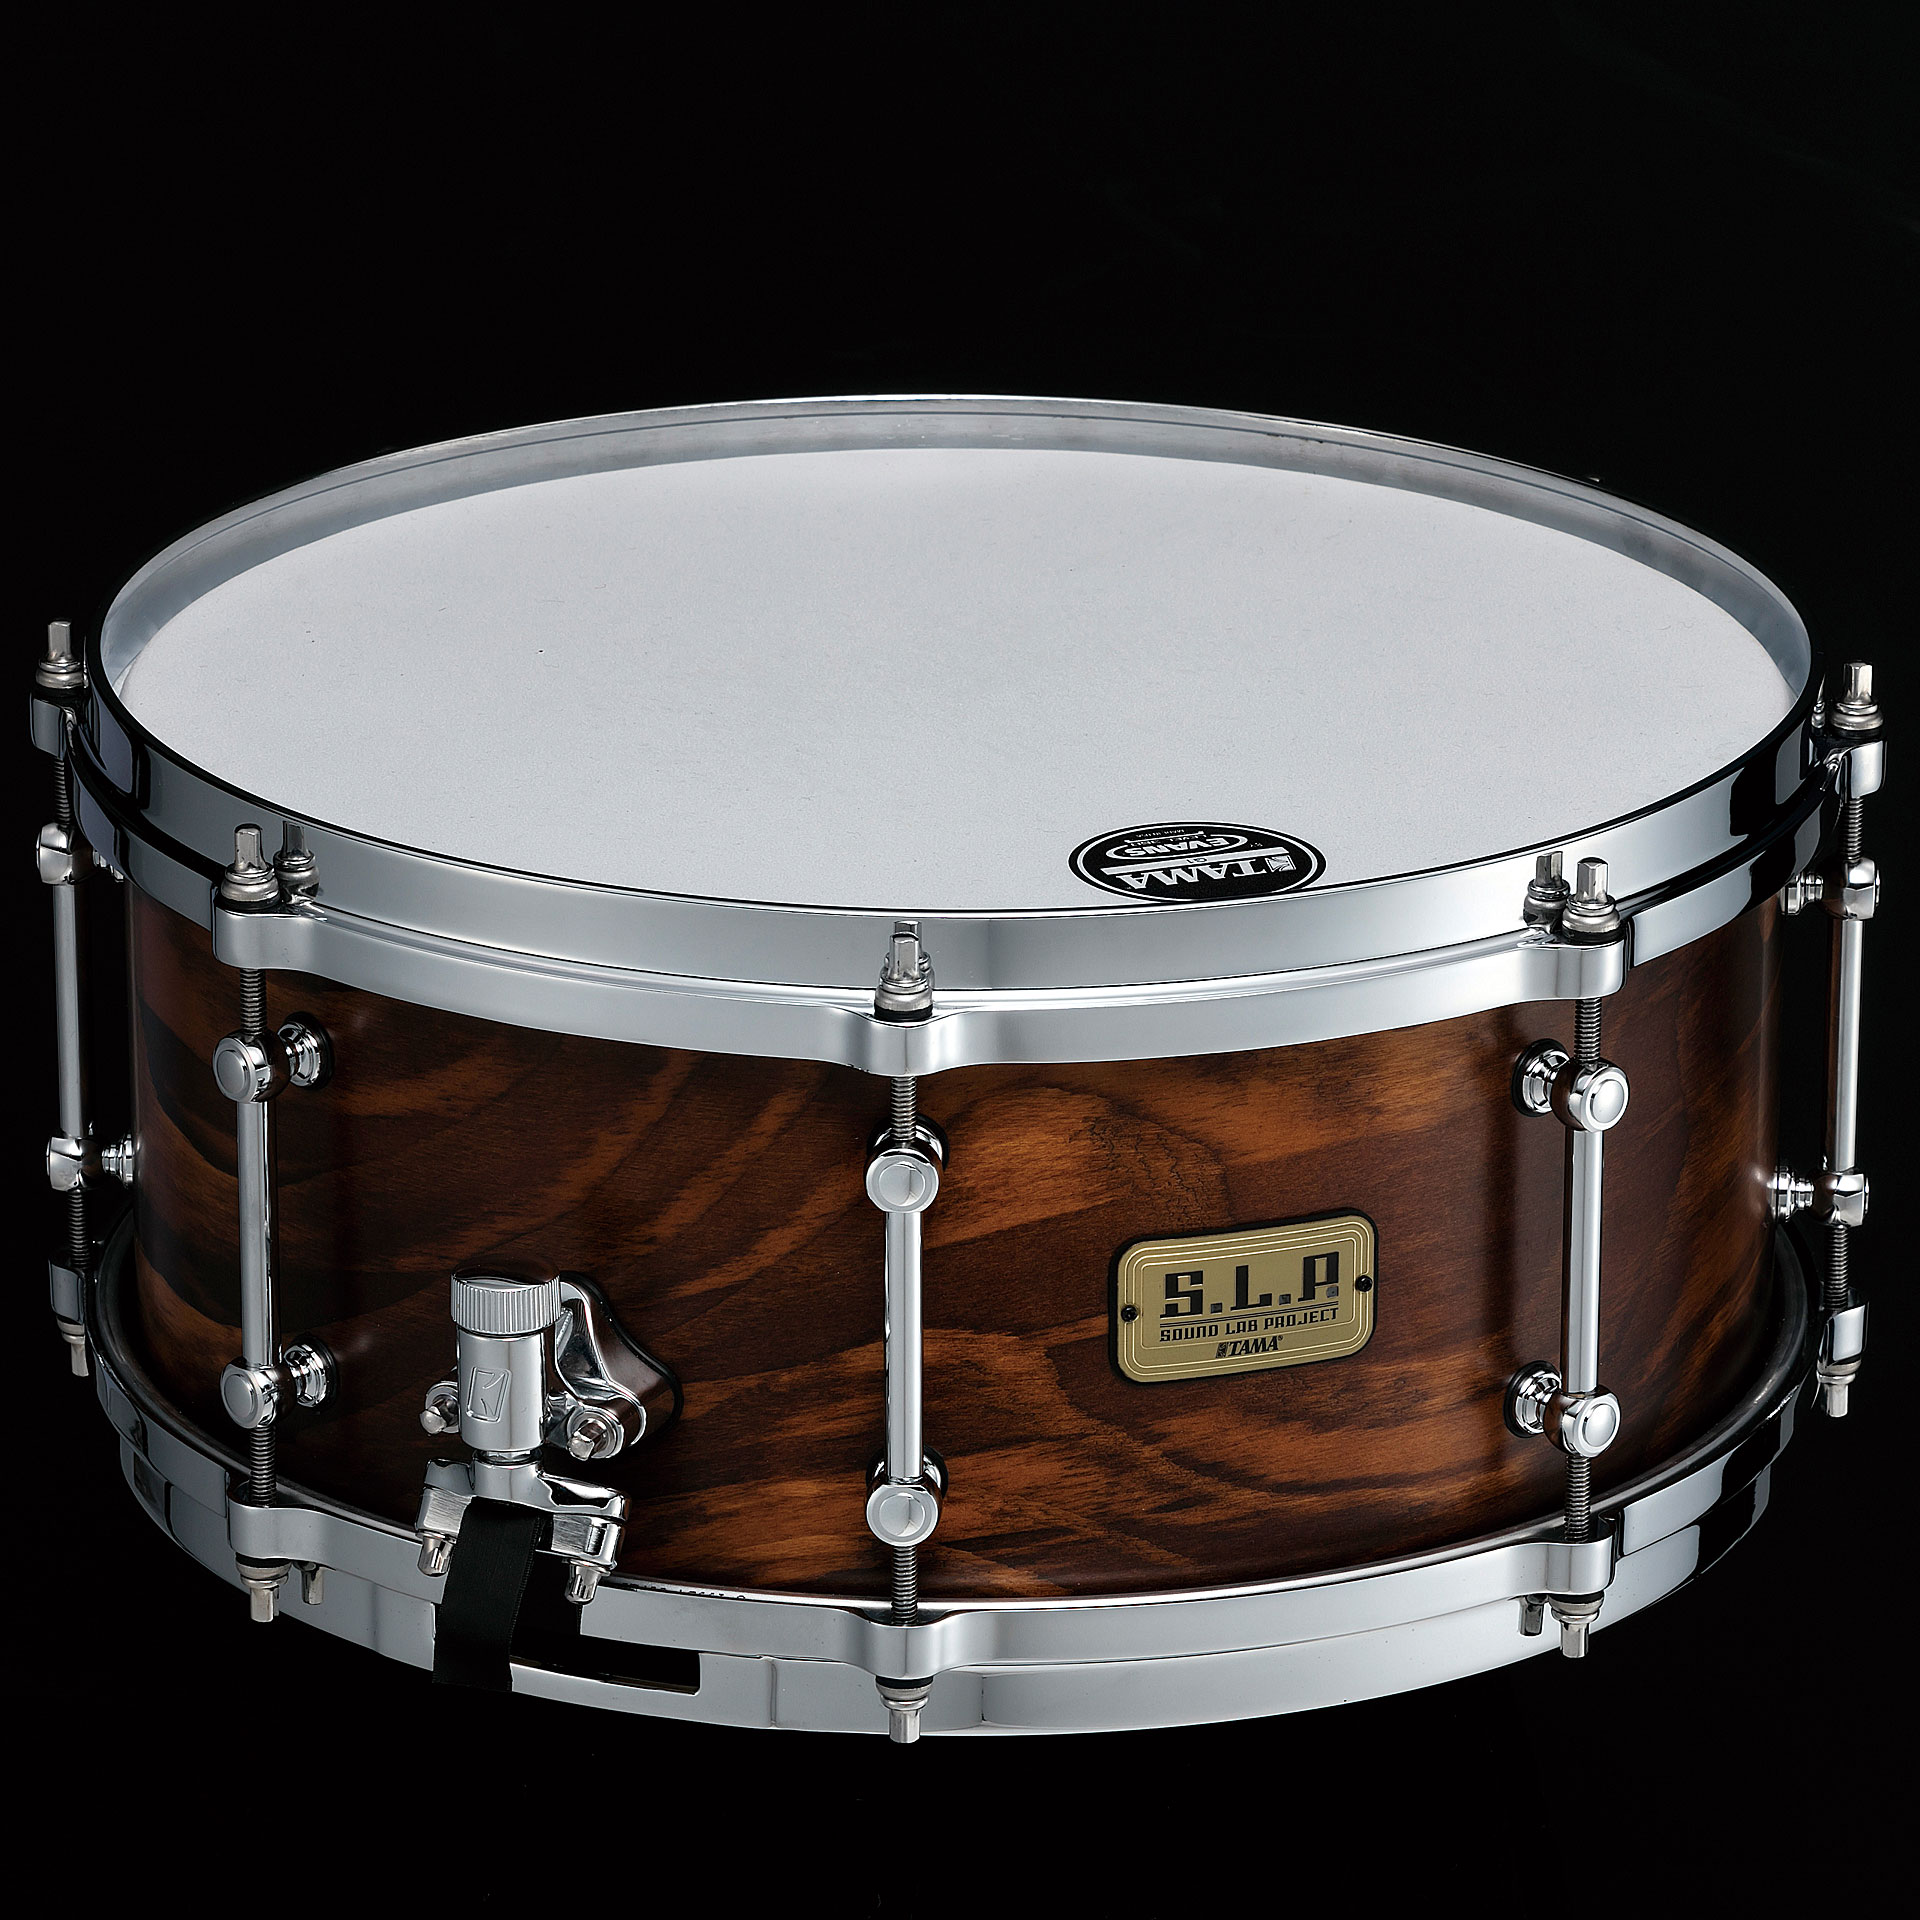 tama s l p 14 x 6 fat spruce snare snare drum. Black Bedroom Furniture Sets. Home Design Ideas